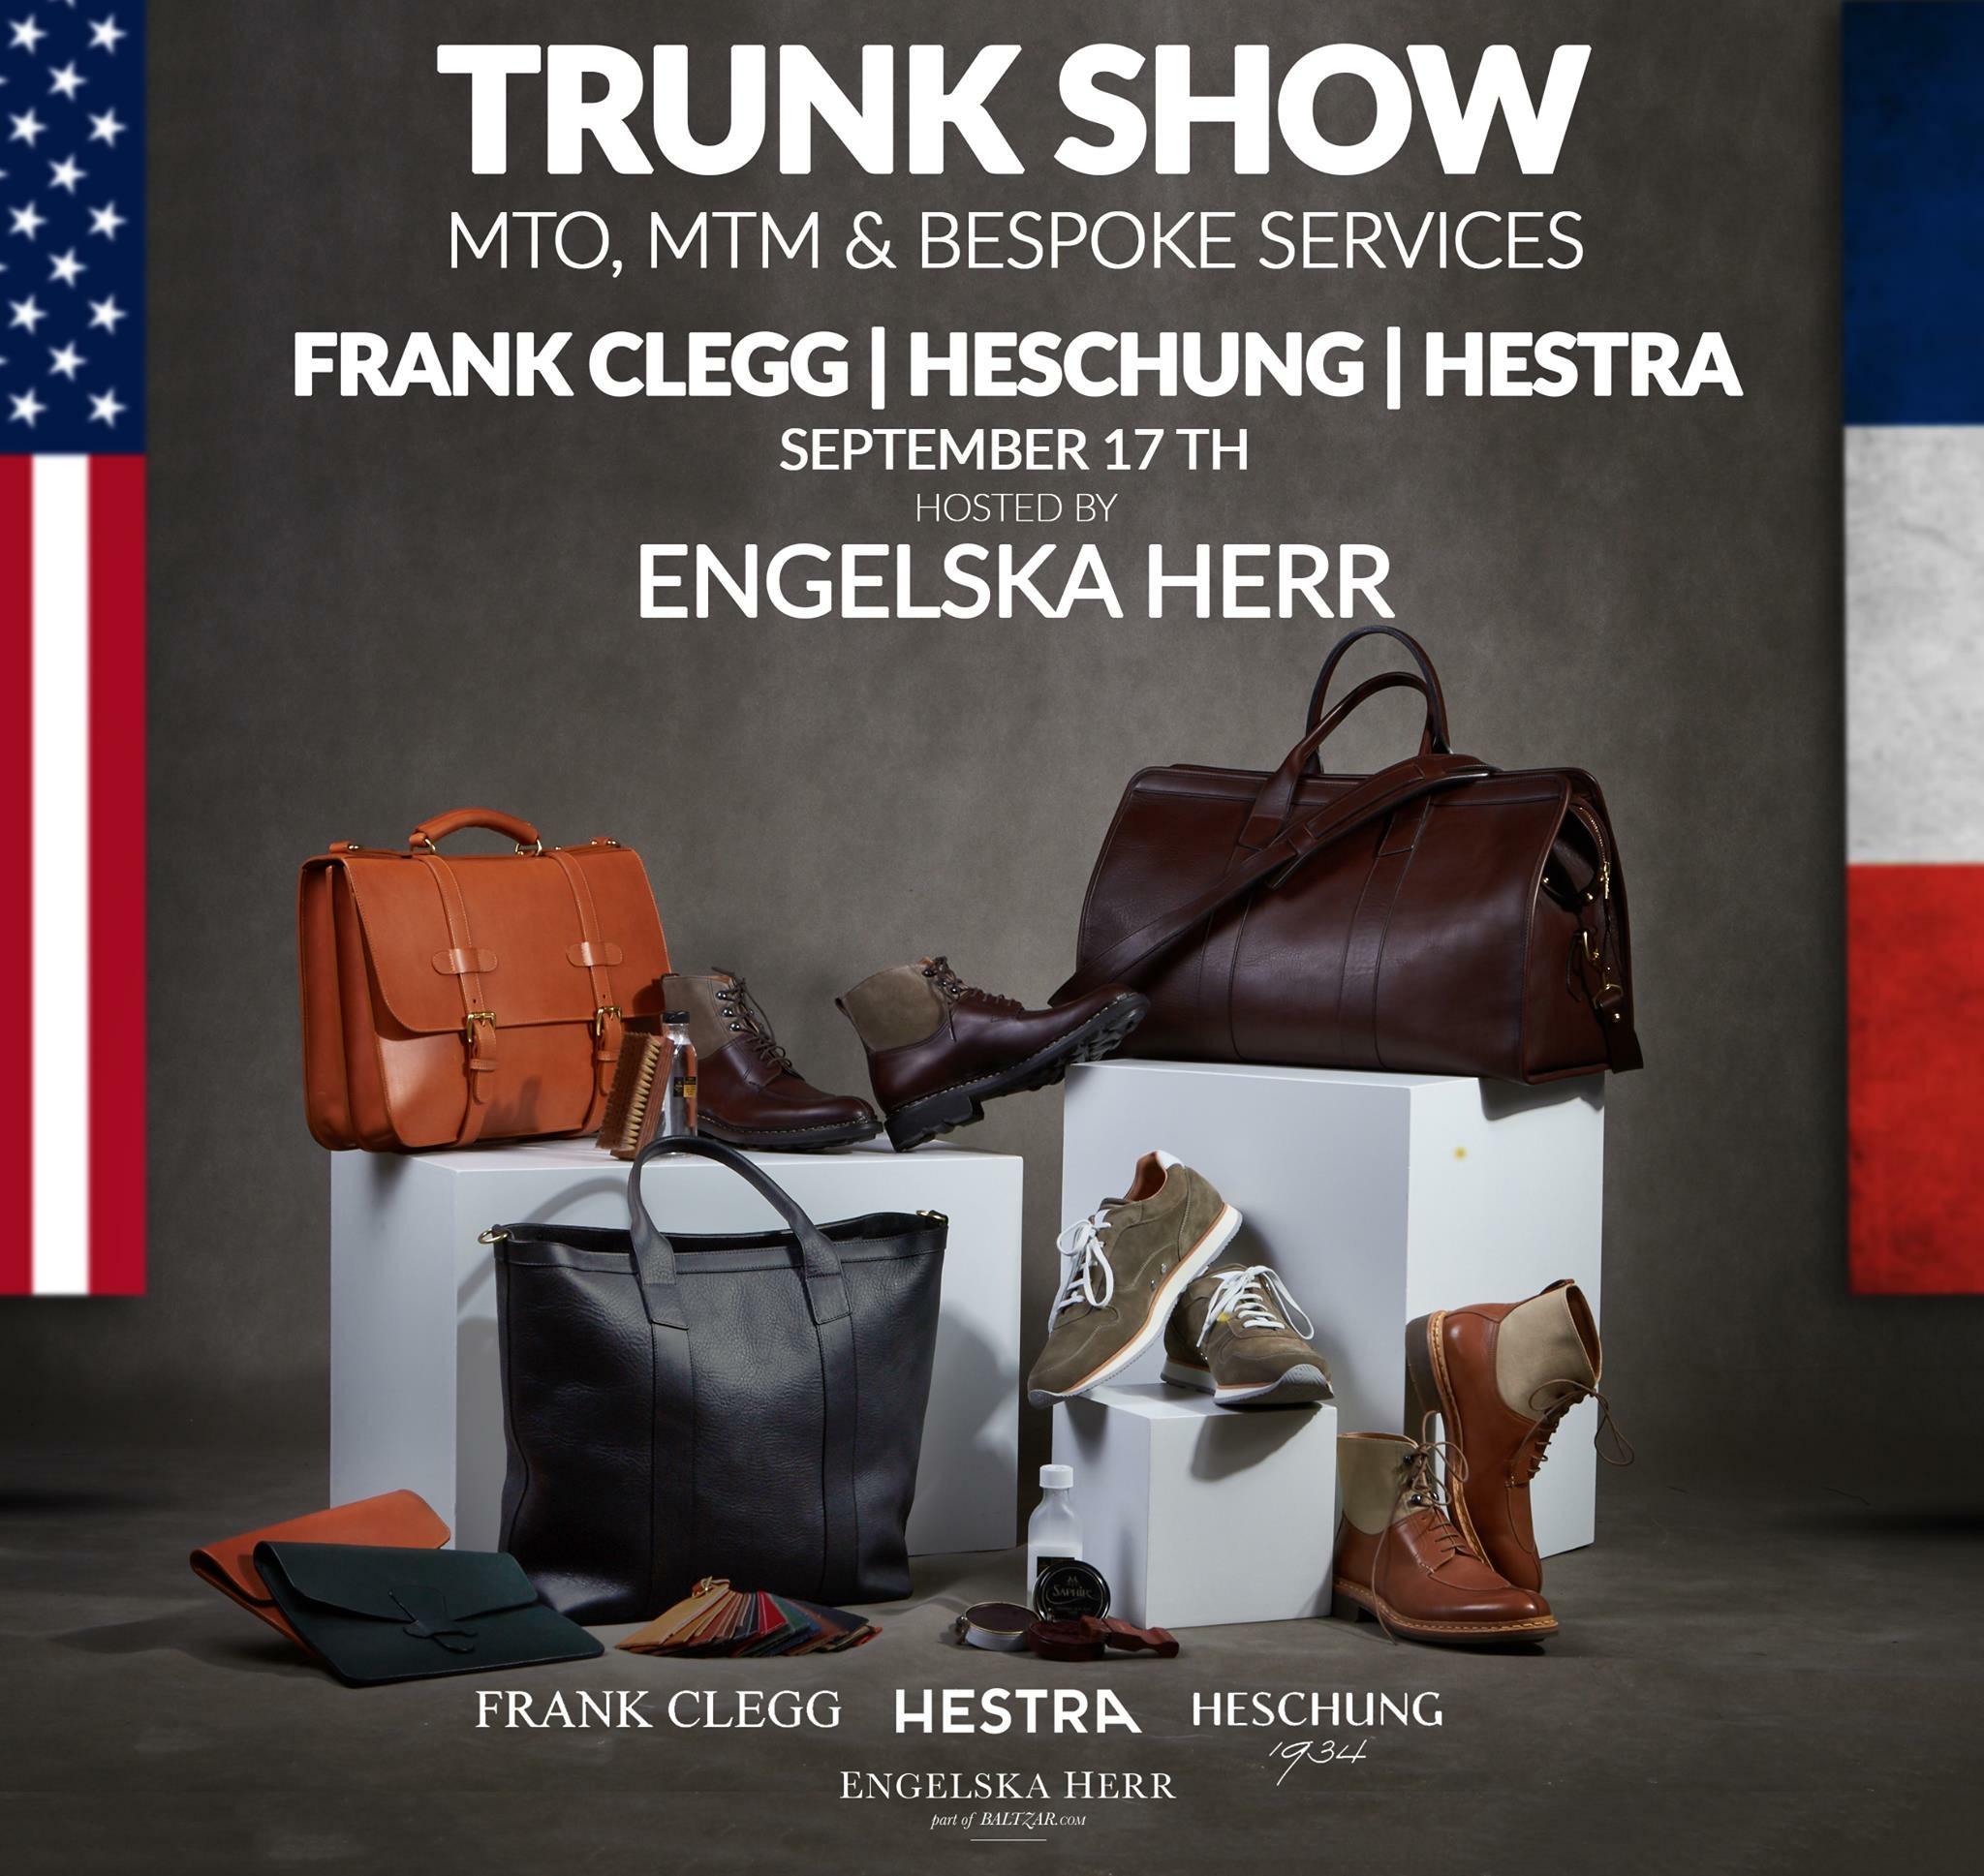 Trunk Show: Frank Clegg, Heschung & Hestra at Engelska Herr